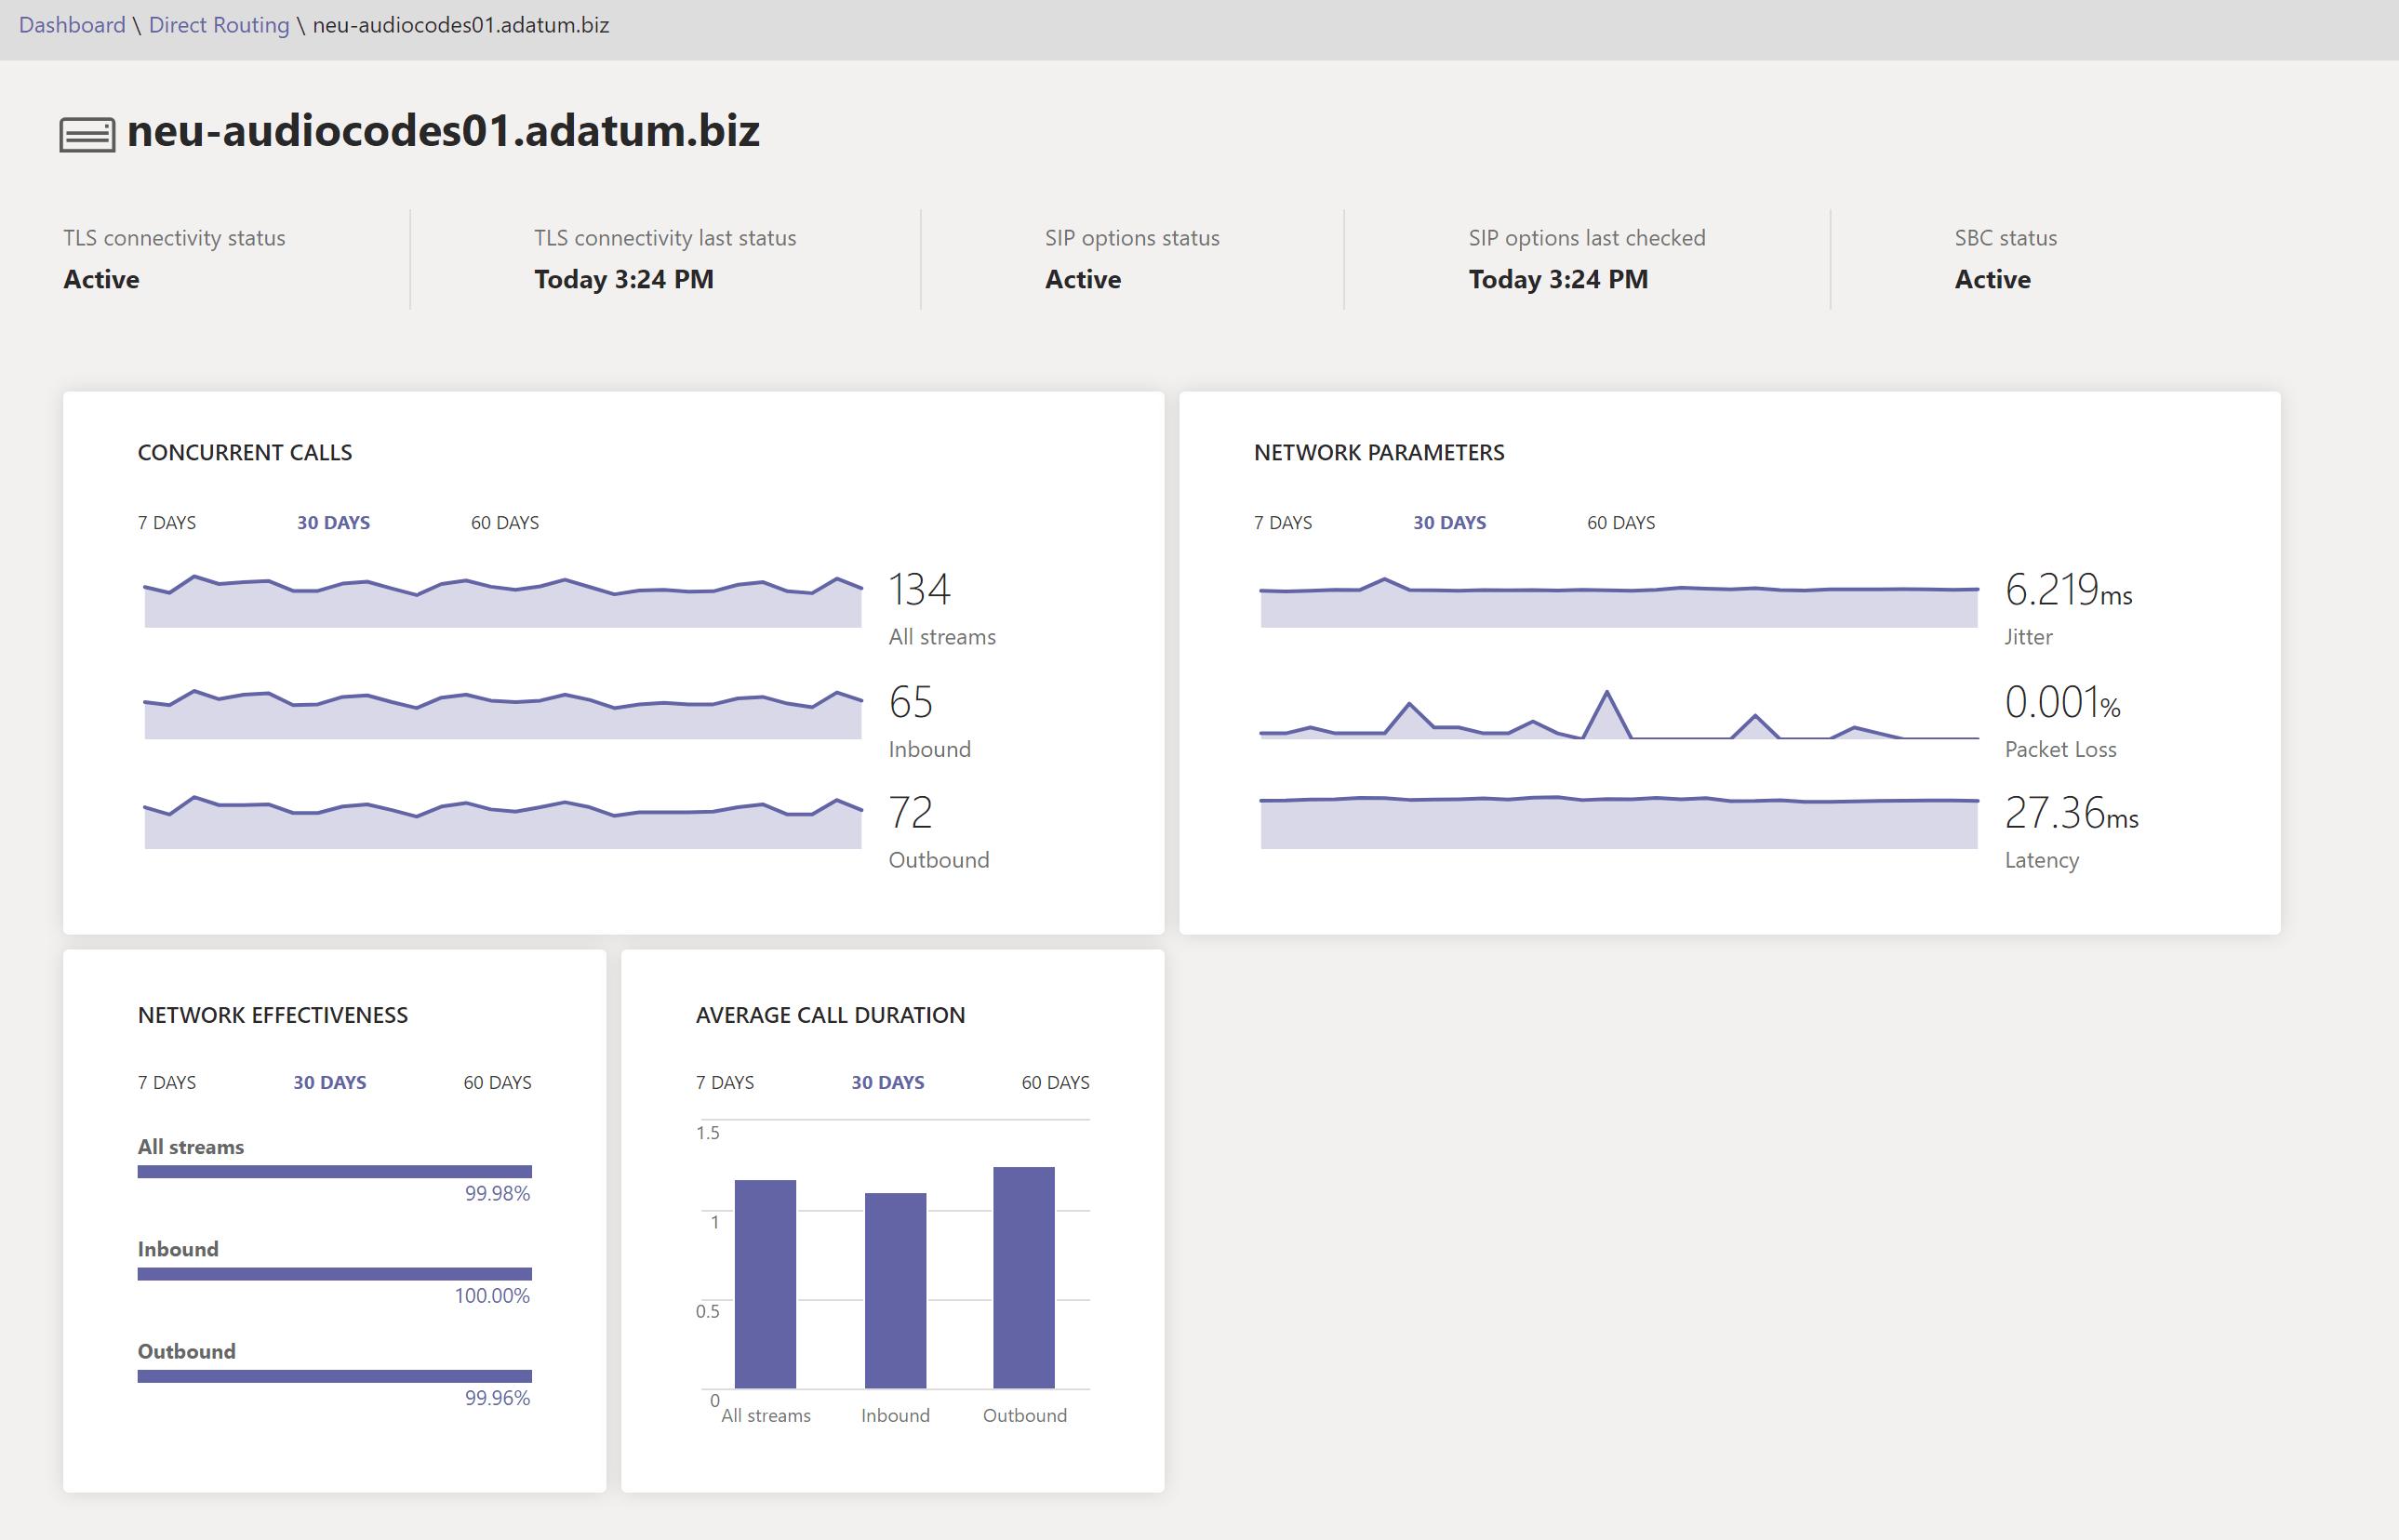 Health dashboard SBC details